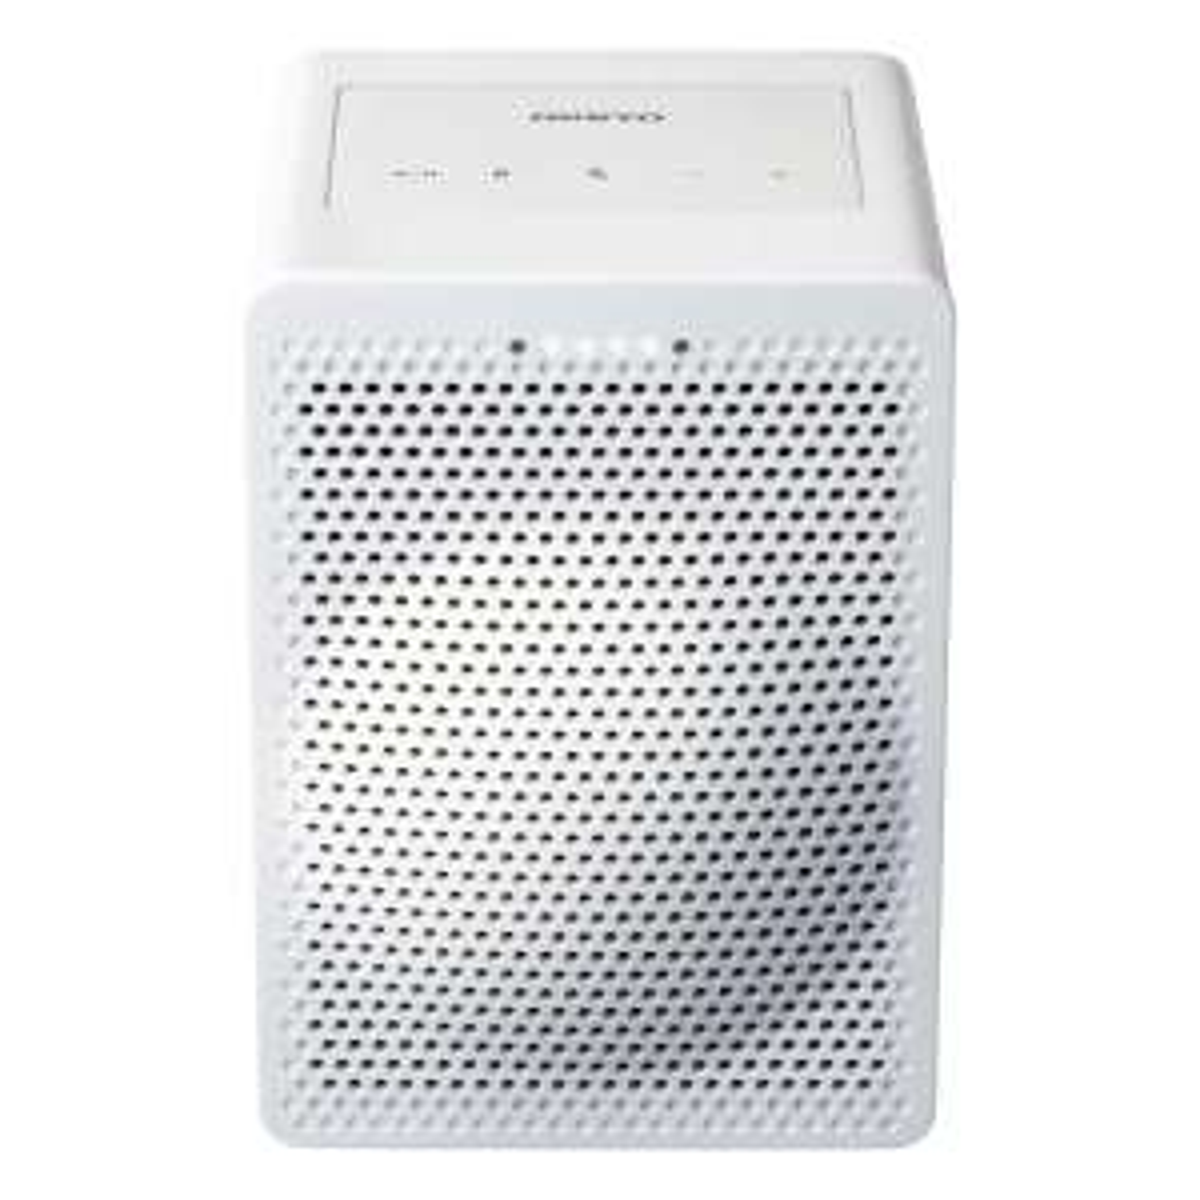 Onkyo VCGX30W Google Home Speaker - Chromecast - White £59.99 @ Hughes